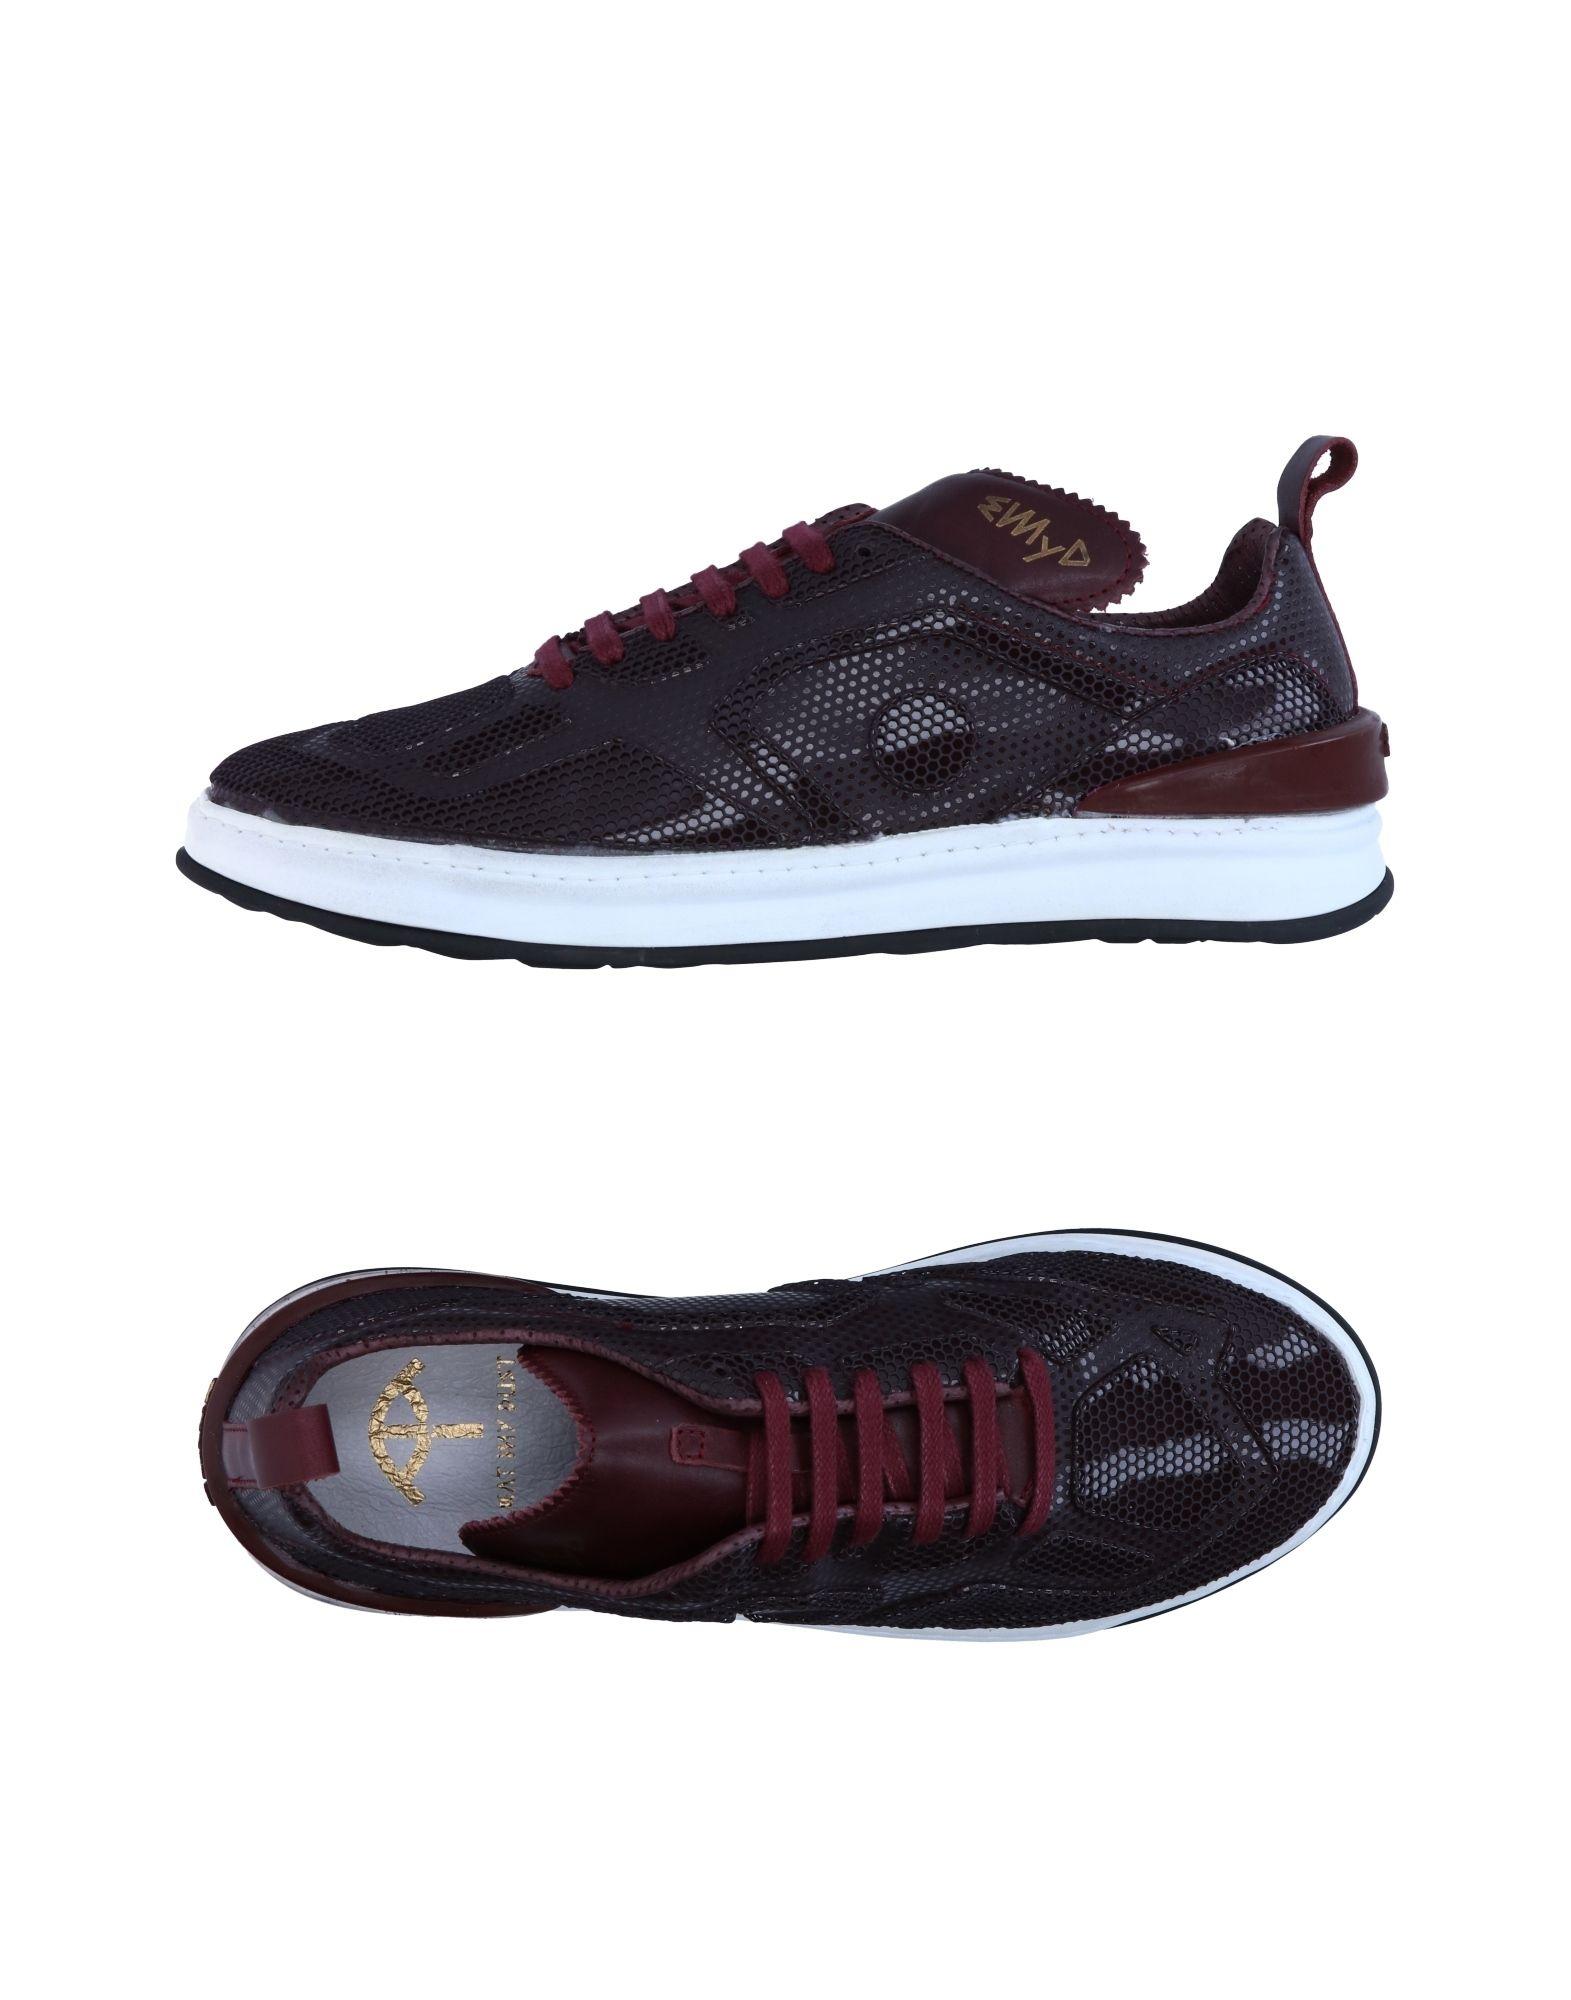 Sneakers Eat My Uomo Dust Uomo My - 11262364WP f8699d